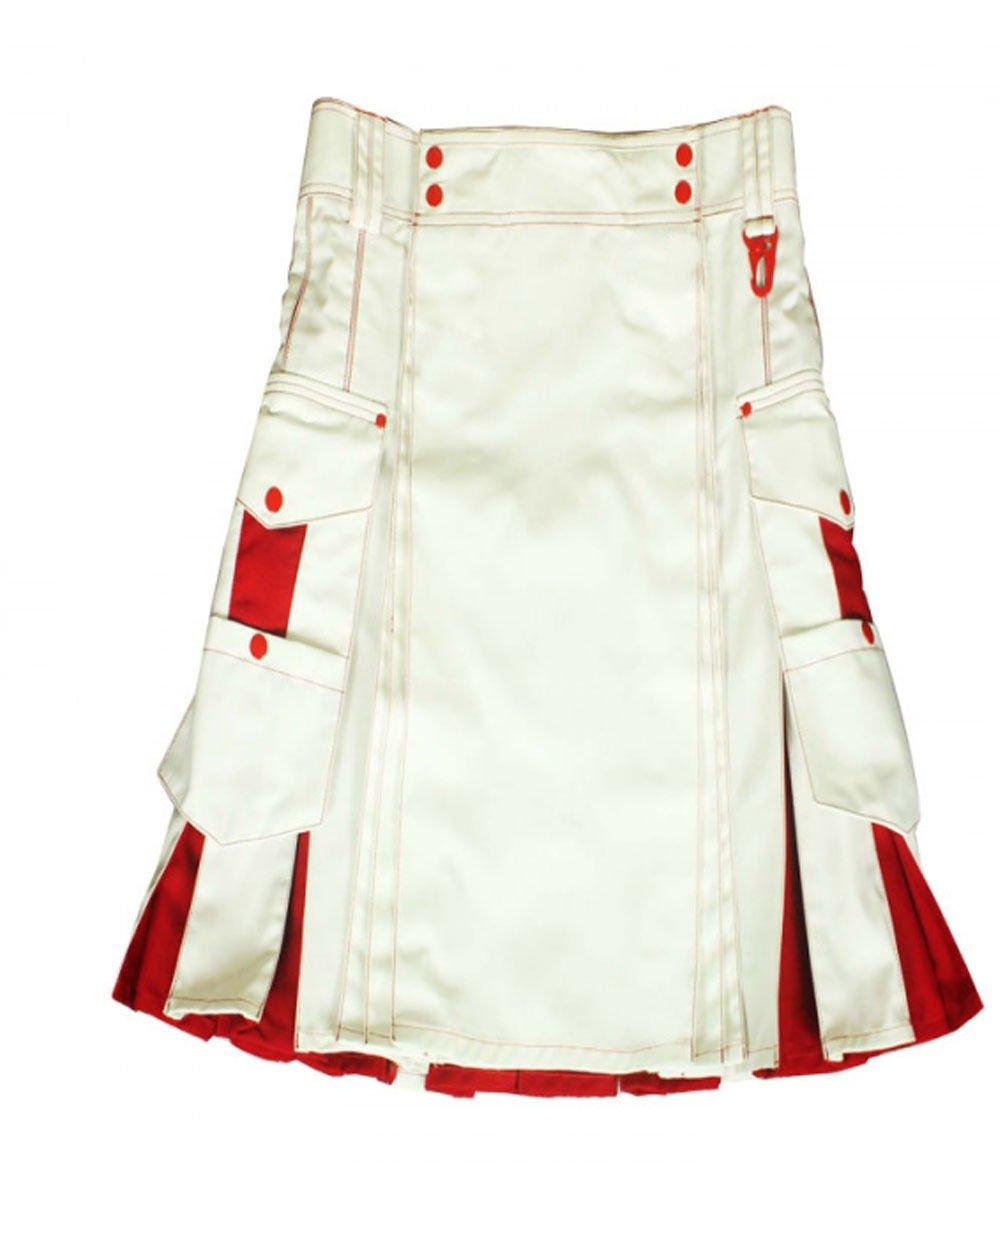 DC Traditional White Scottish Modern Utility Kilt Handmade 100% Cotton Size 50